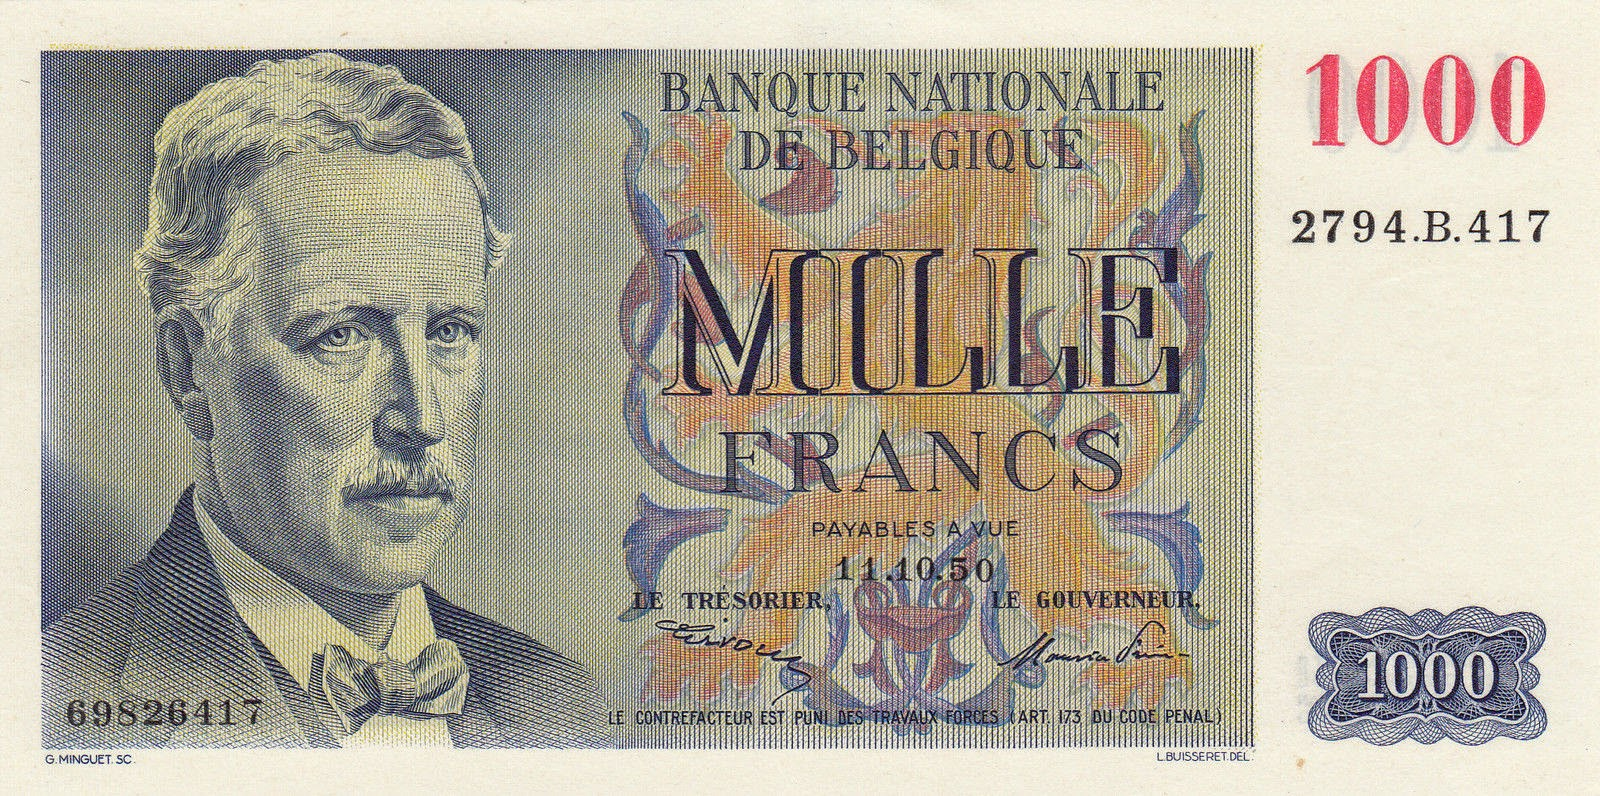 Belgium Banknotes 1000 Francs banknote 1950 King Albert I